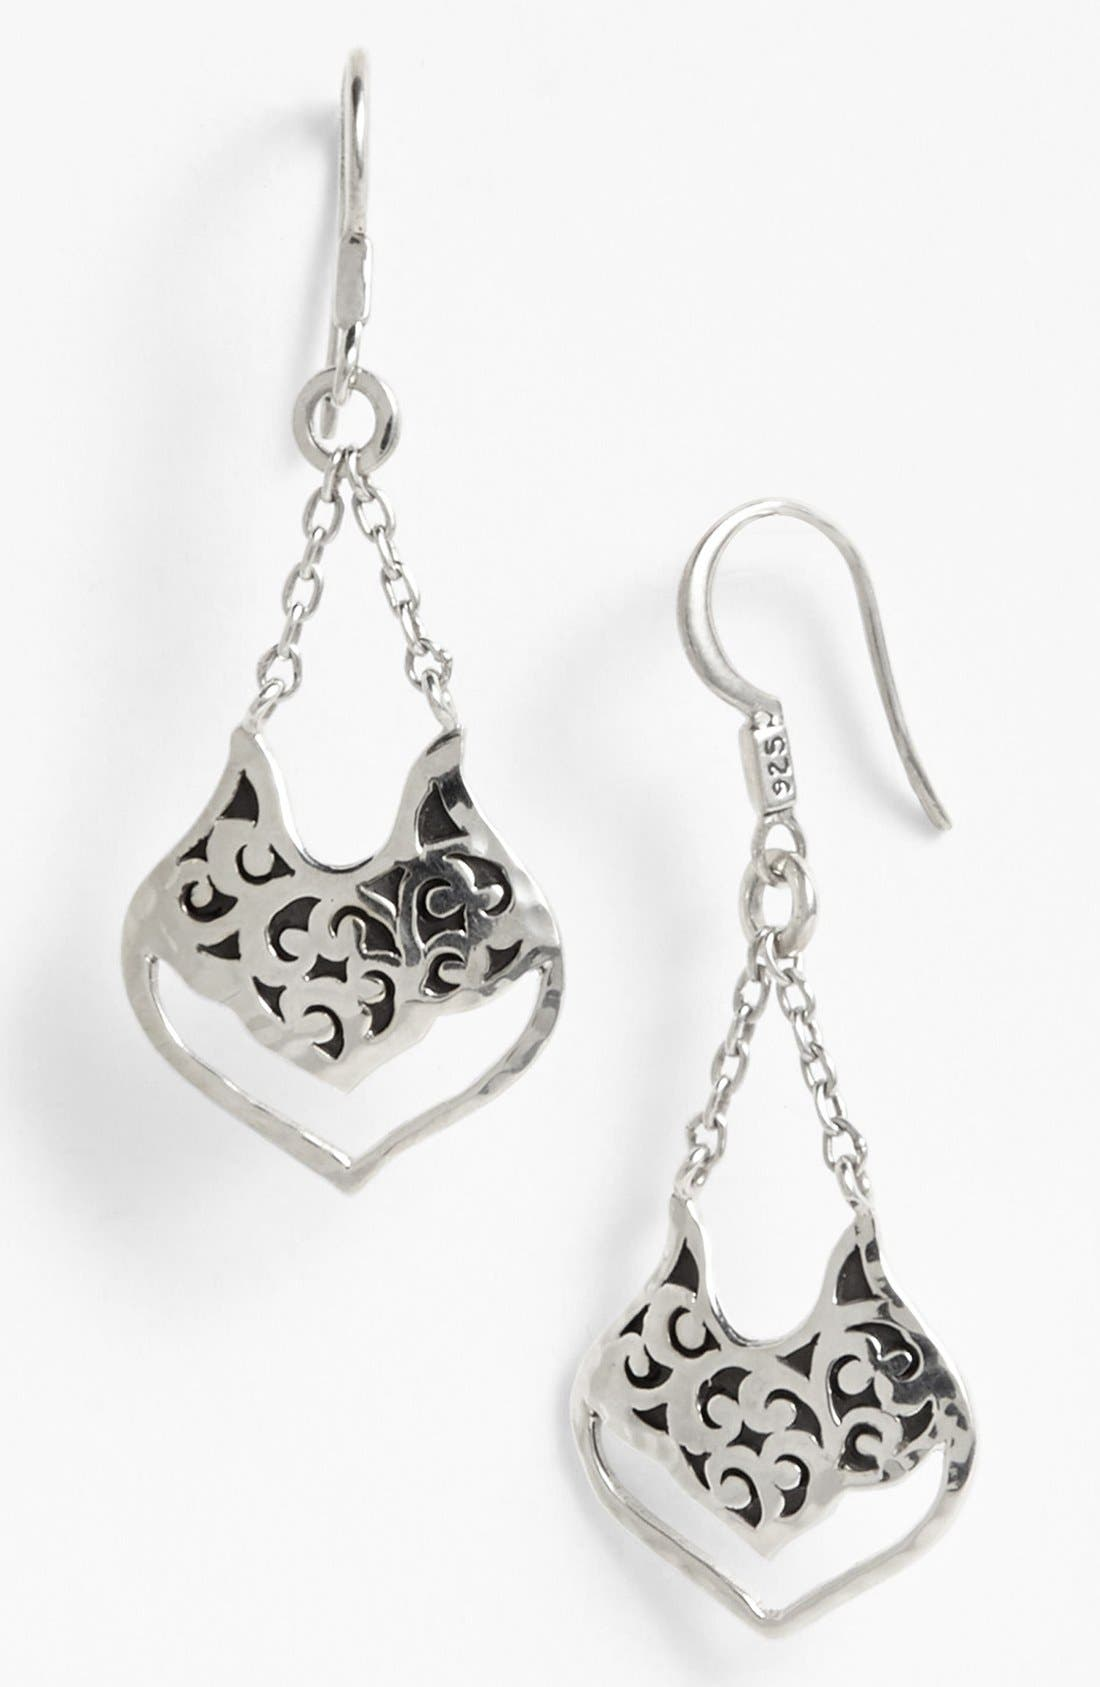 Main Image - Lois Hill Small Open Drop Earrings